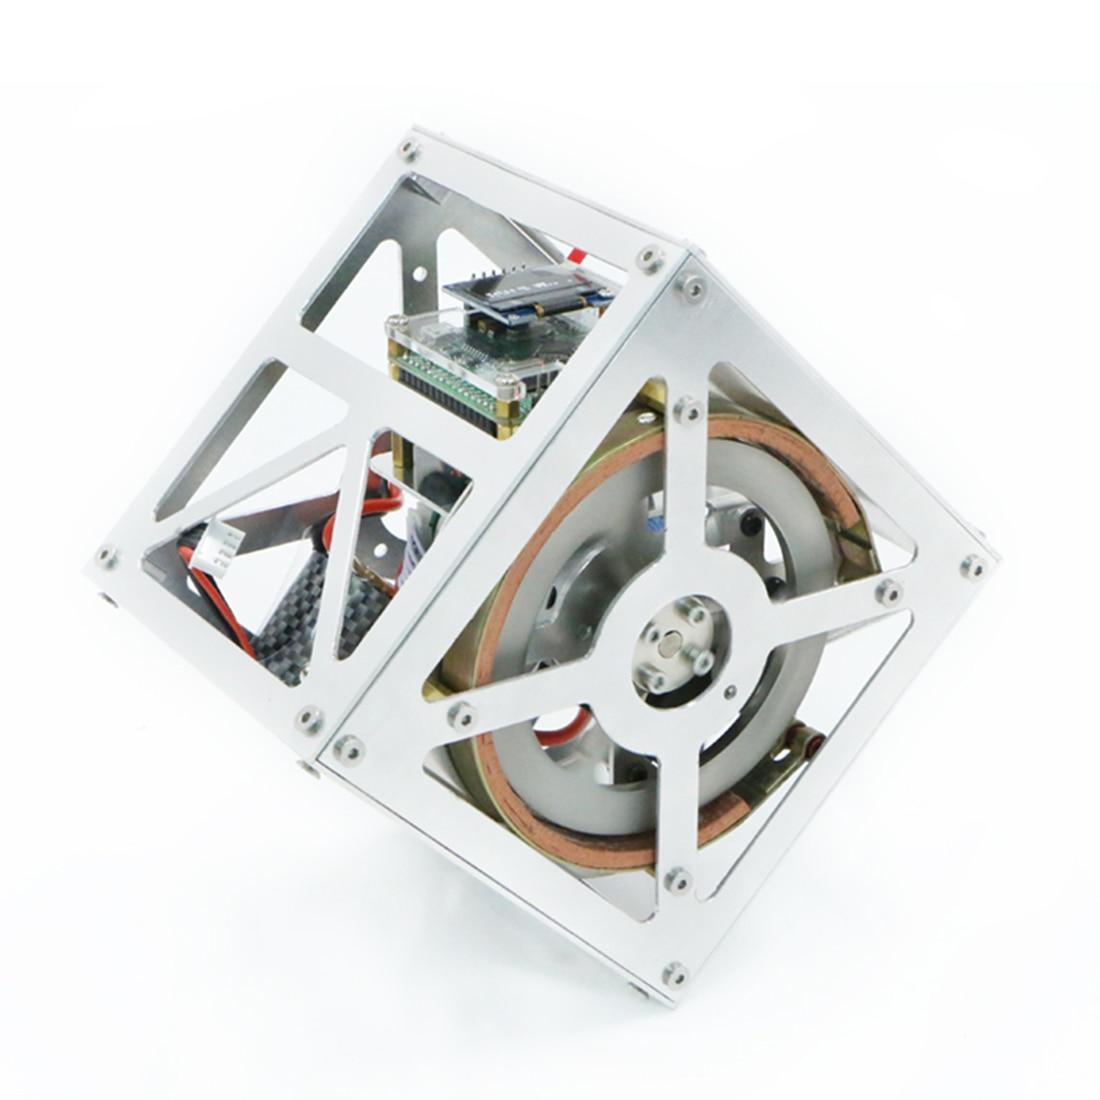 Single Point Balance Block Unilateral Self-balancing Cubli Bblock Intelligent Steam Toy Kits 1